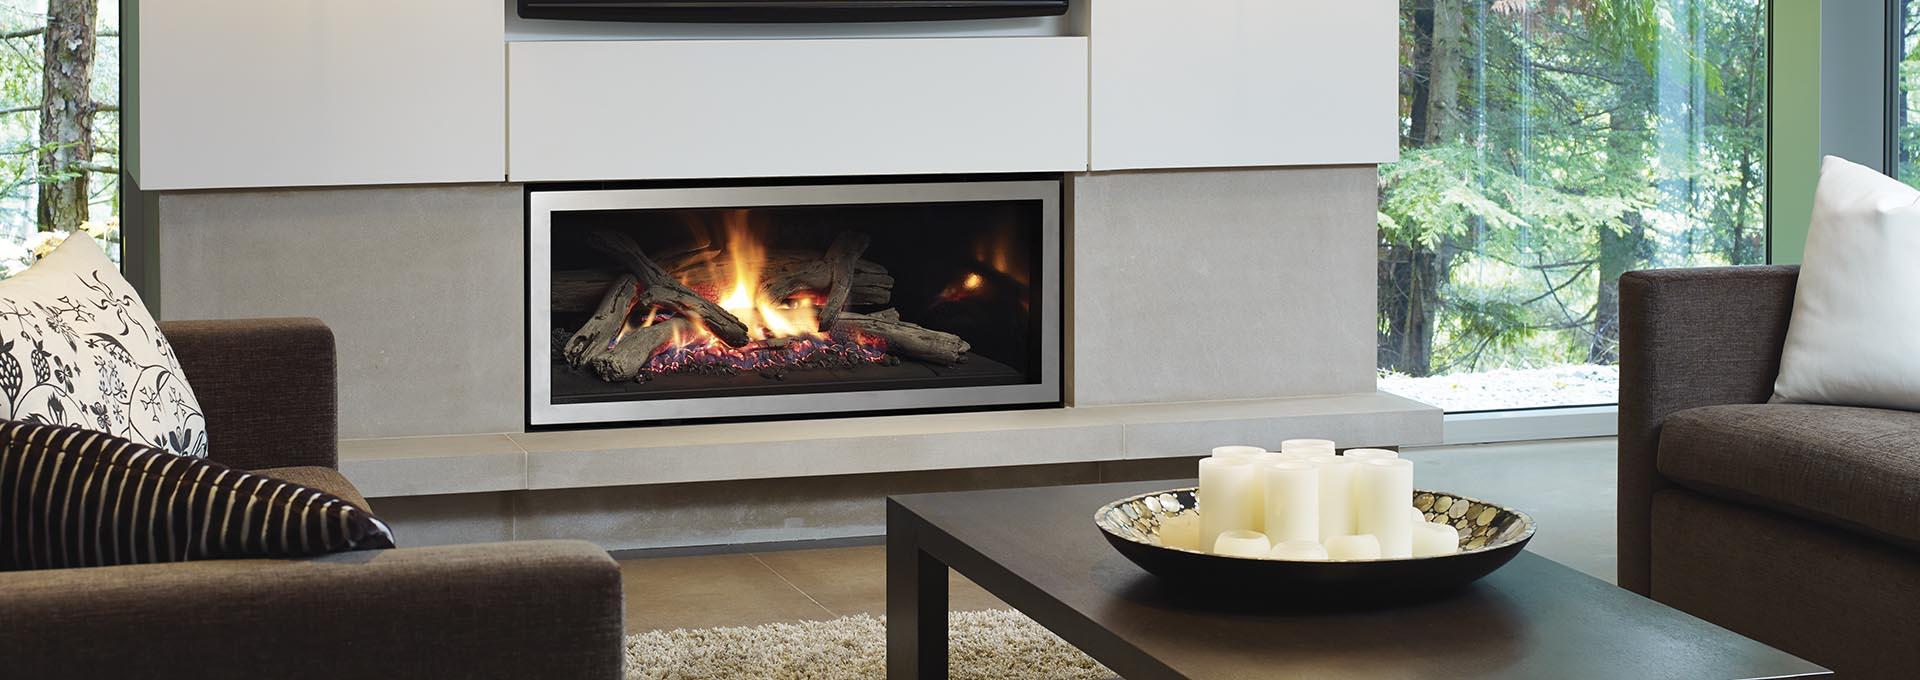 Strange Gas Fireplaces Regency Fireplace Products Australia Interior Design Ideas Grebswwsoteloinfo